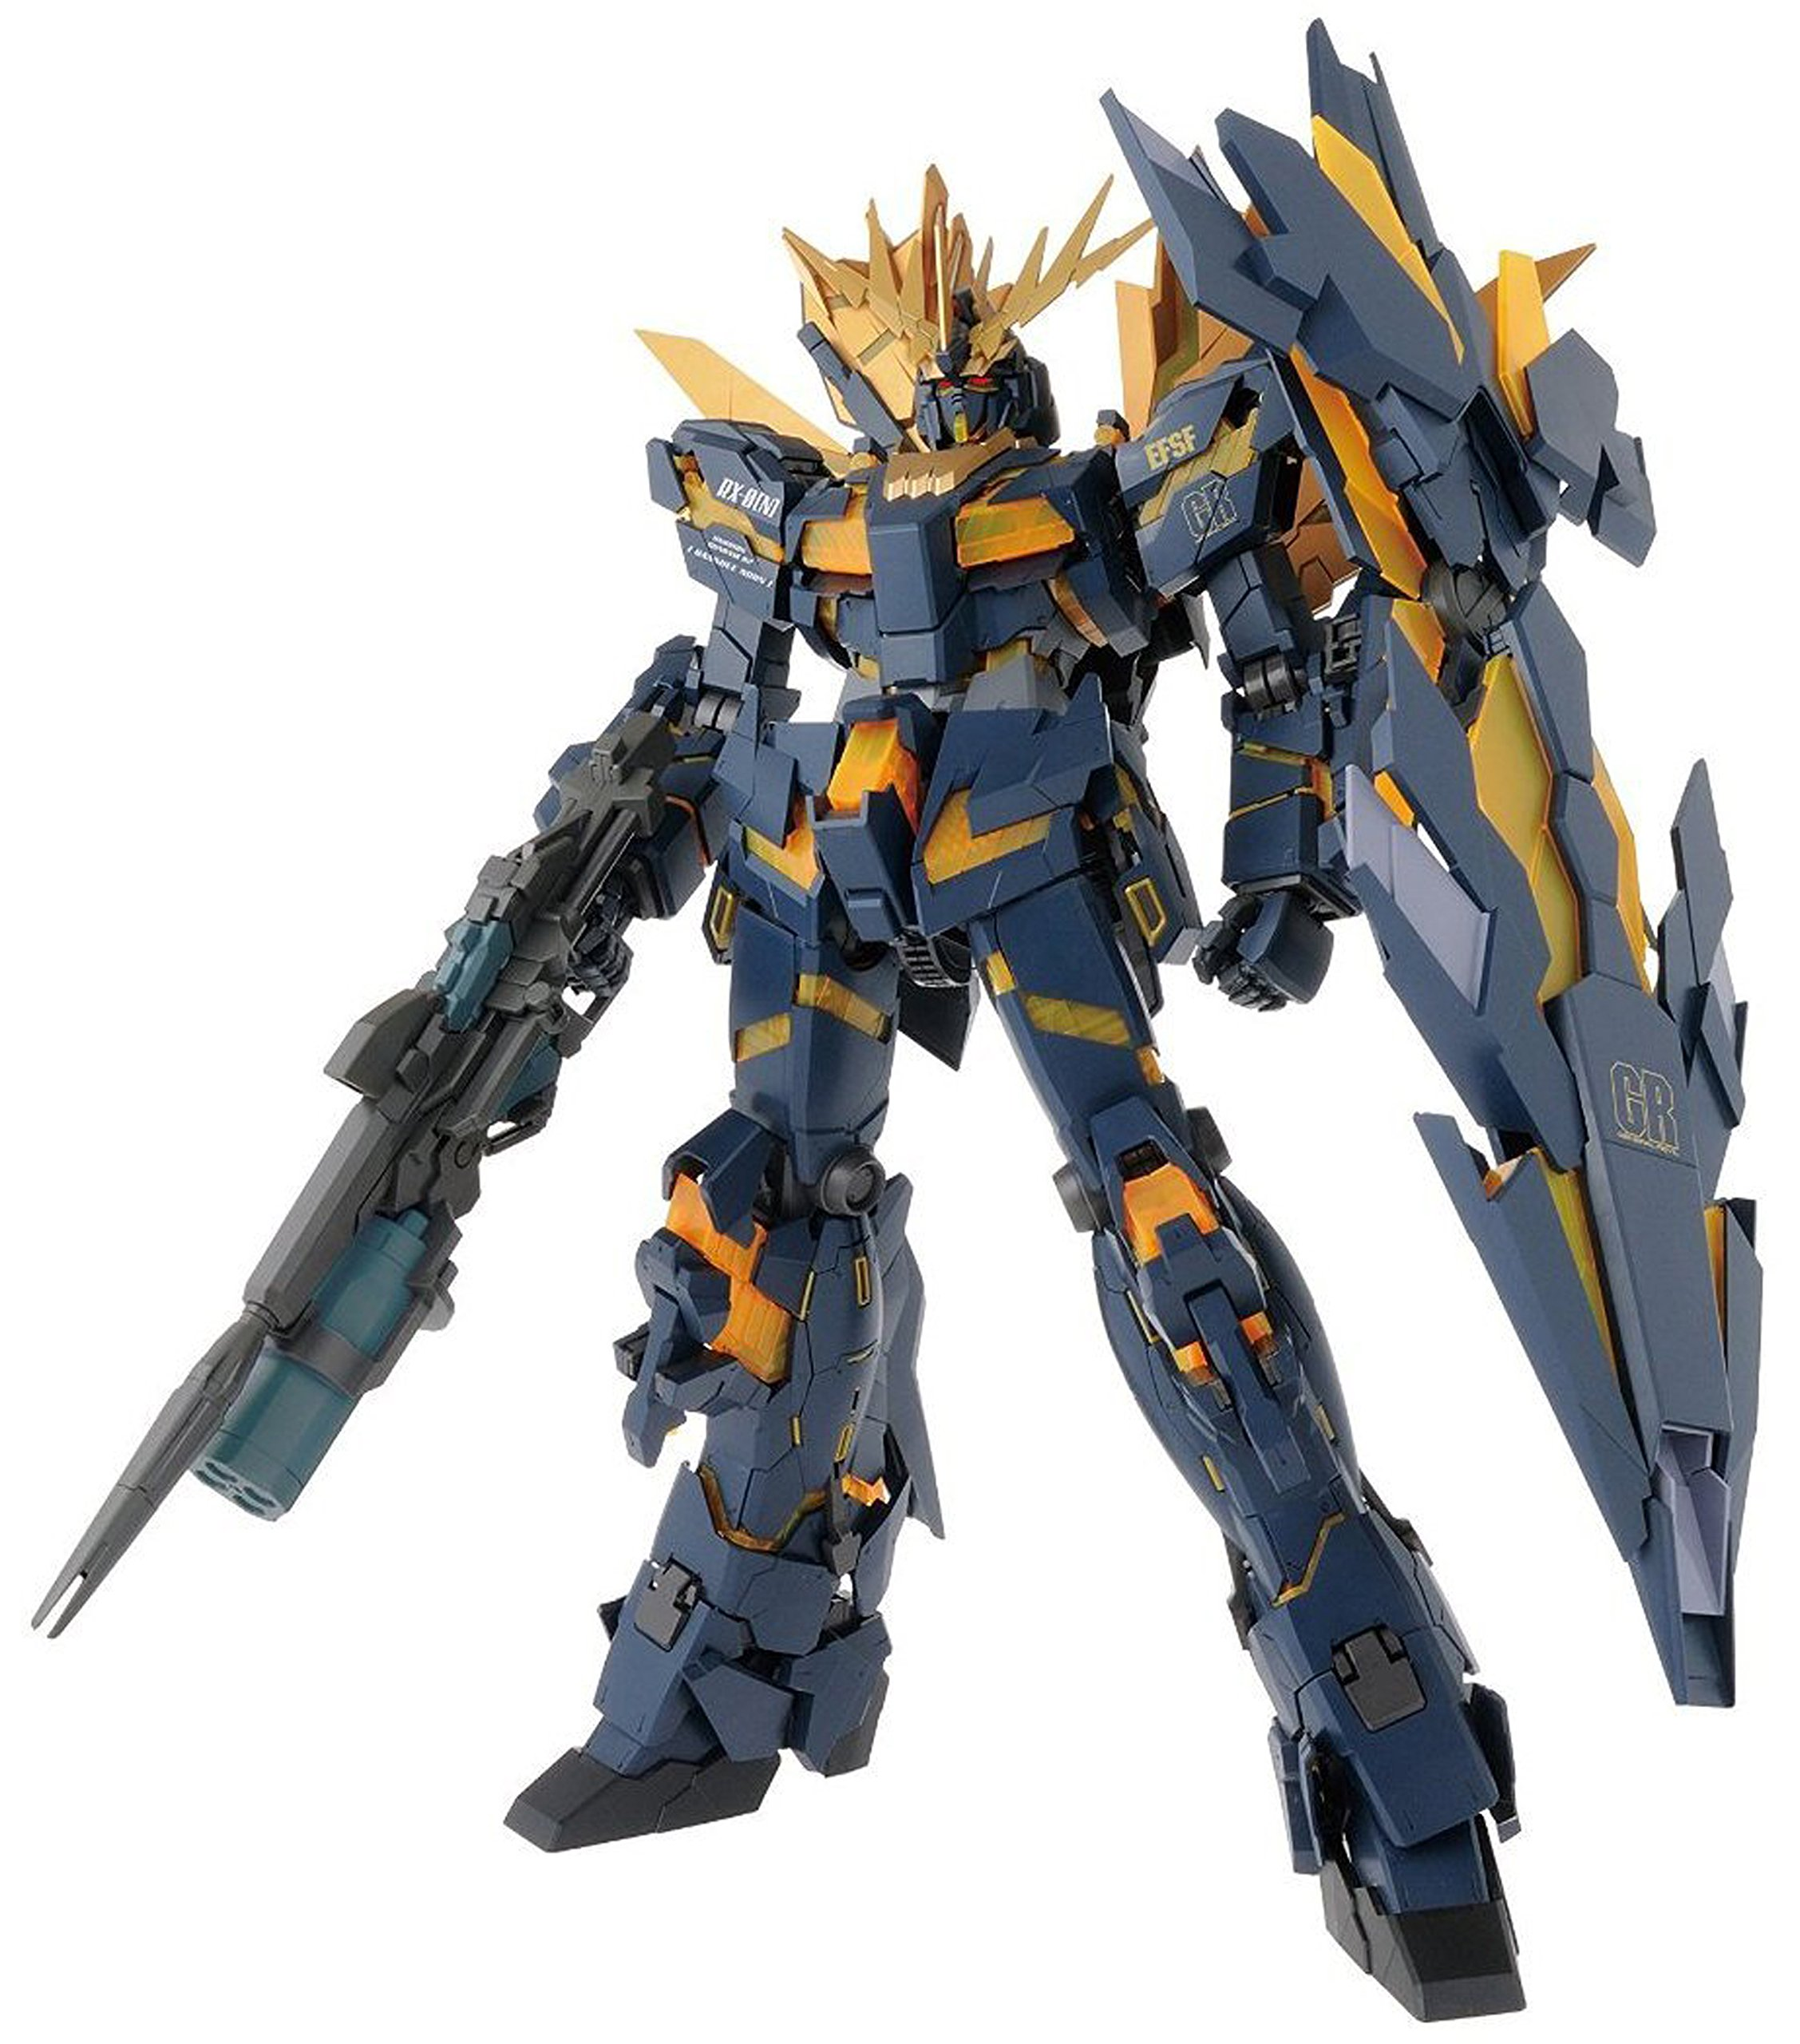 Bandai Hobby PG 1/60 Unicorn Gundam 02 Banshee Norn ''Gundam UC'' Action Figure